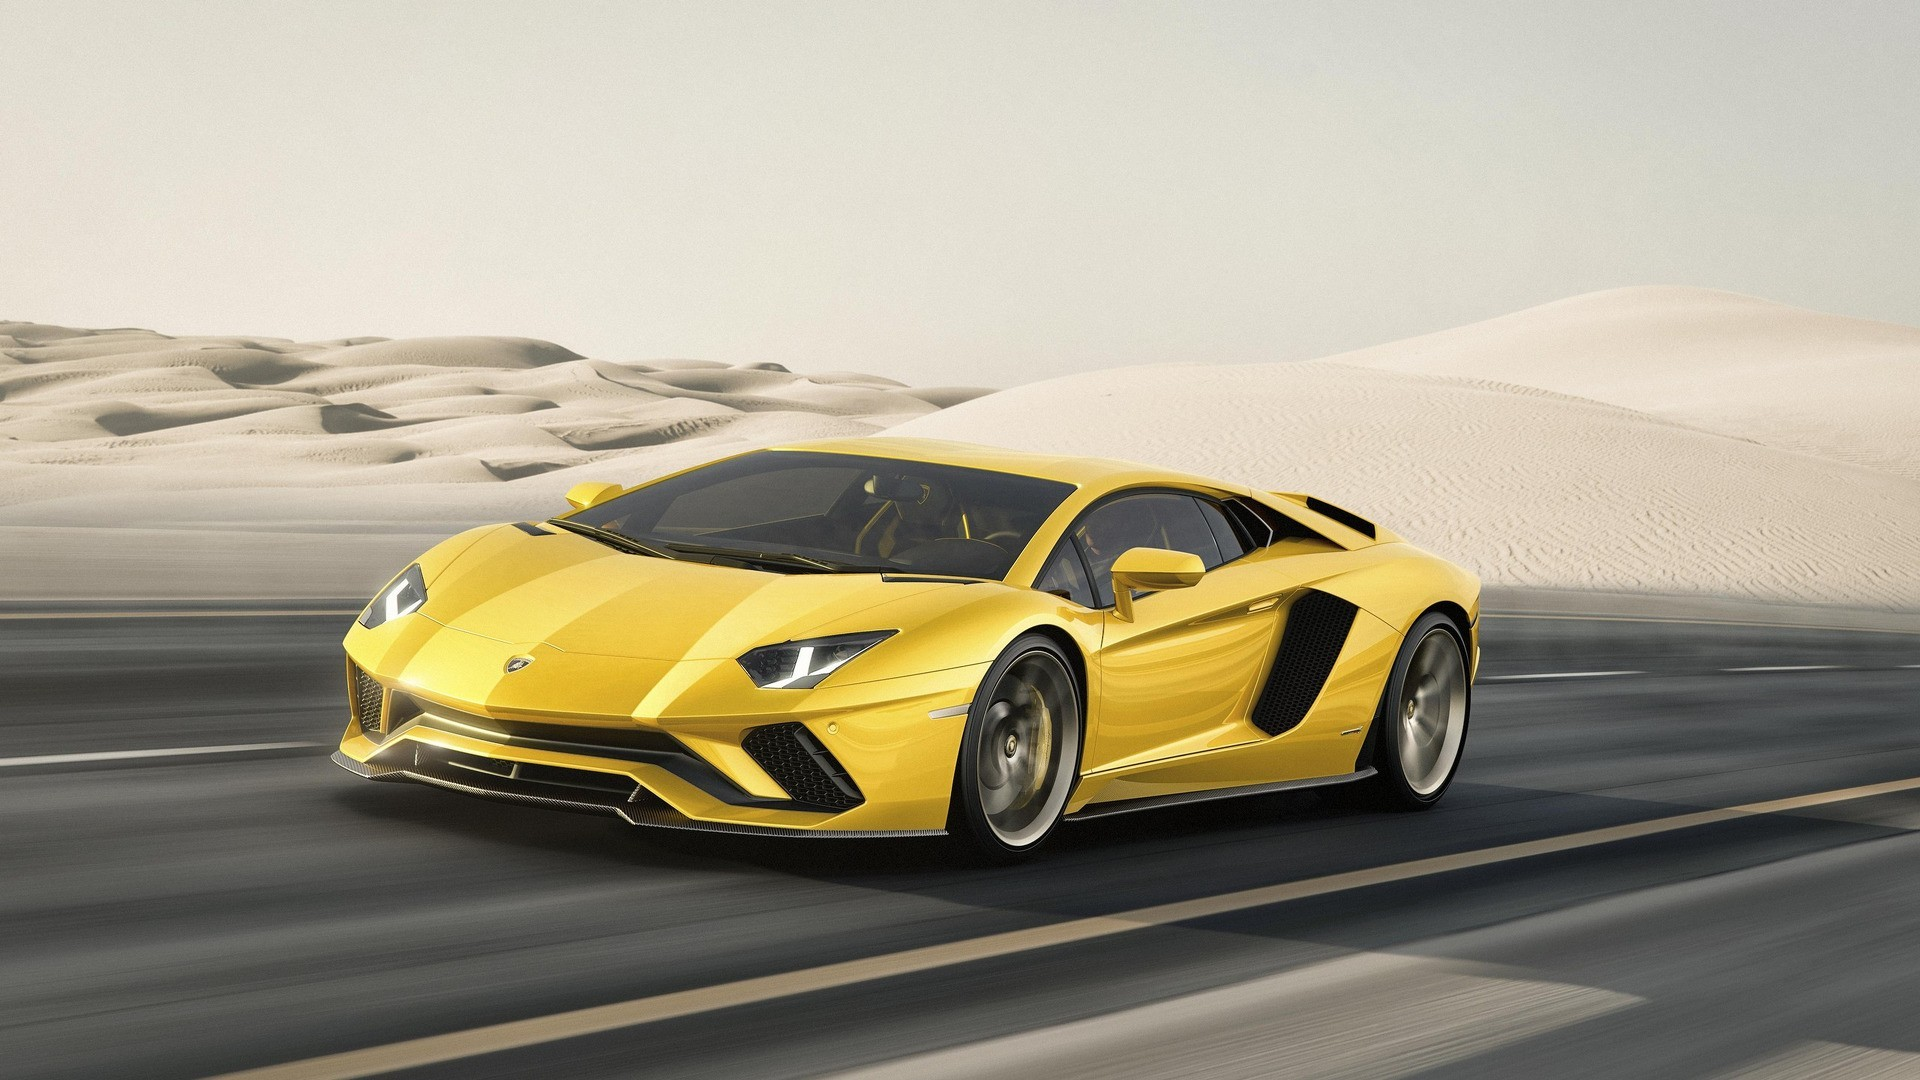 Суперкар Lamborghini Huracan превратят вкроссовер